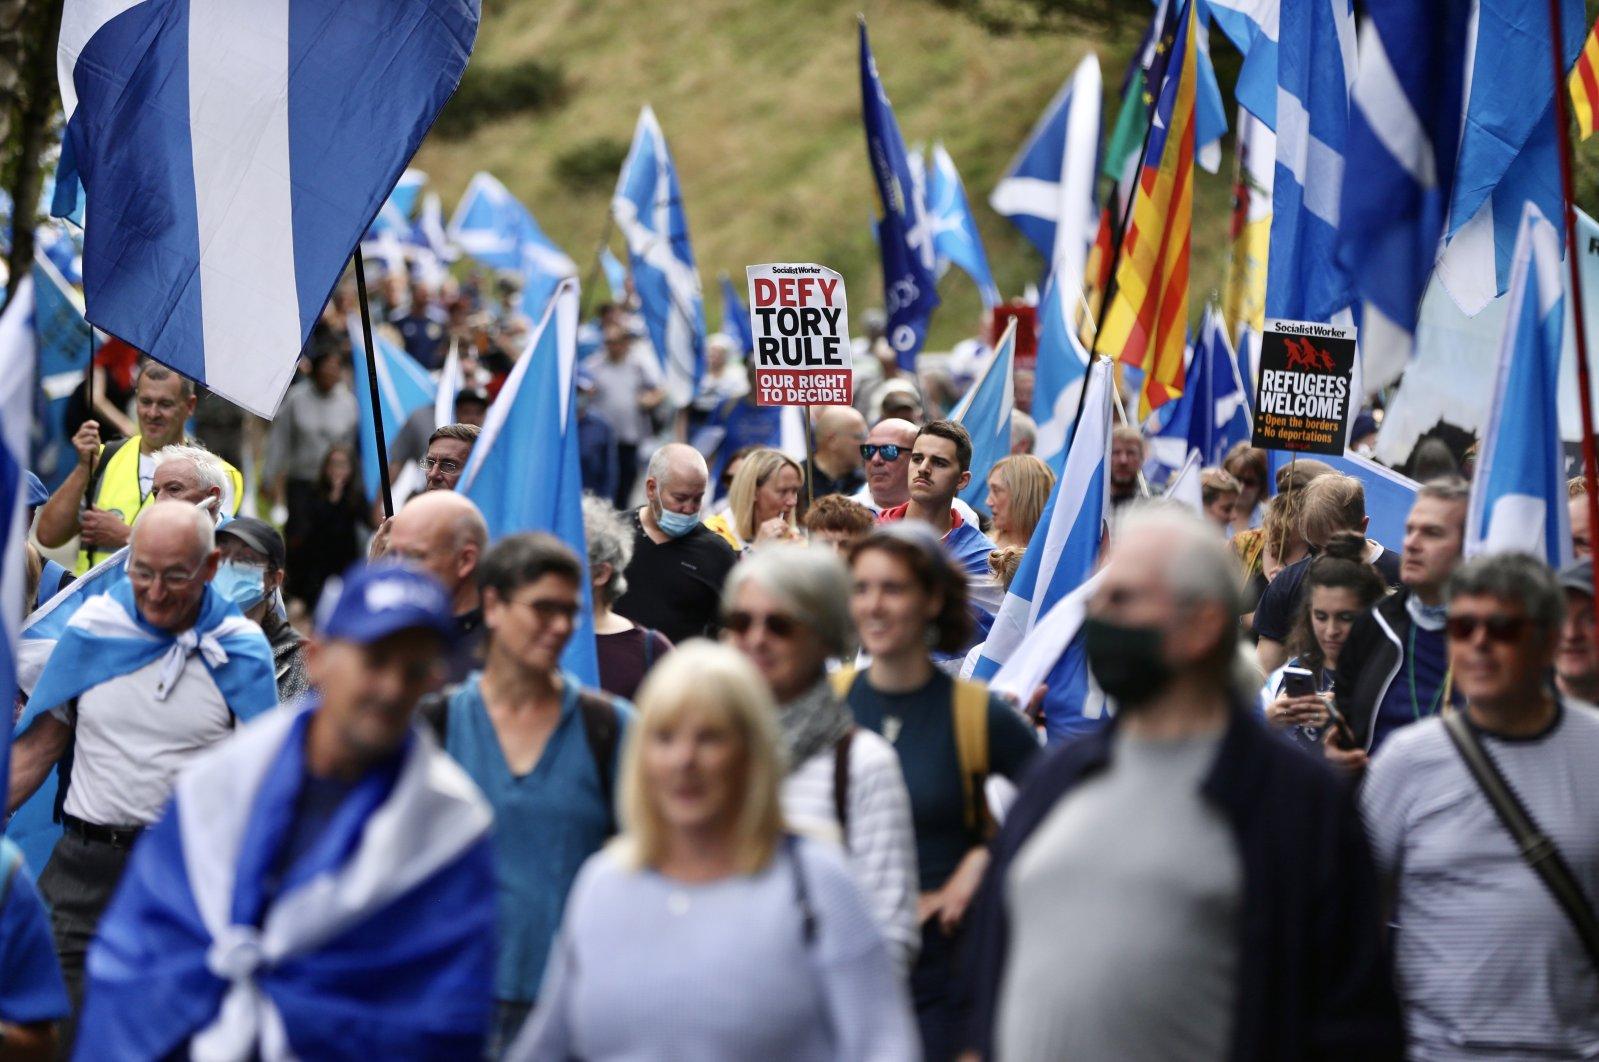 Demonstrators demanding new independence vote march to Scottish Parliament, Edinburgh, Sept. 25, 2021. (AA Photo)